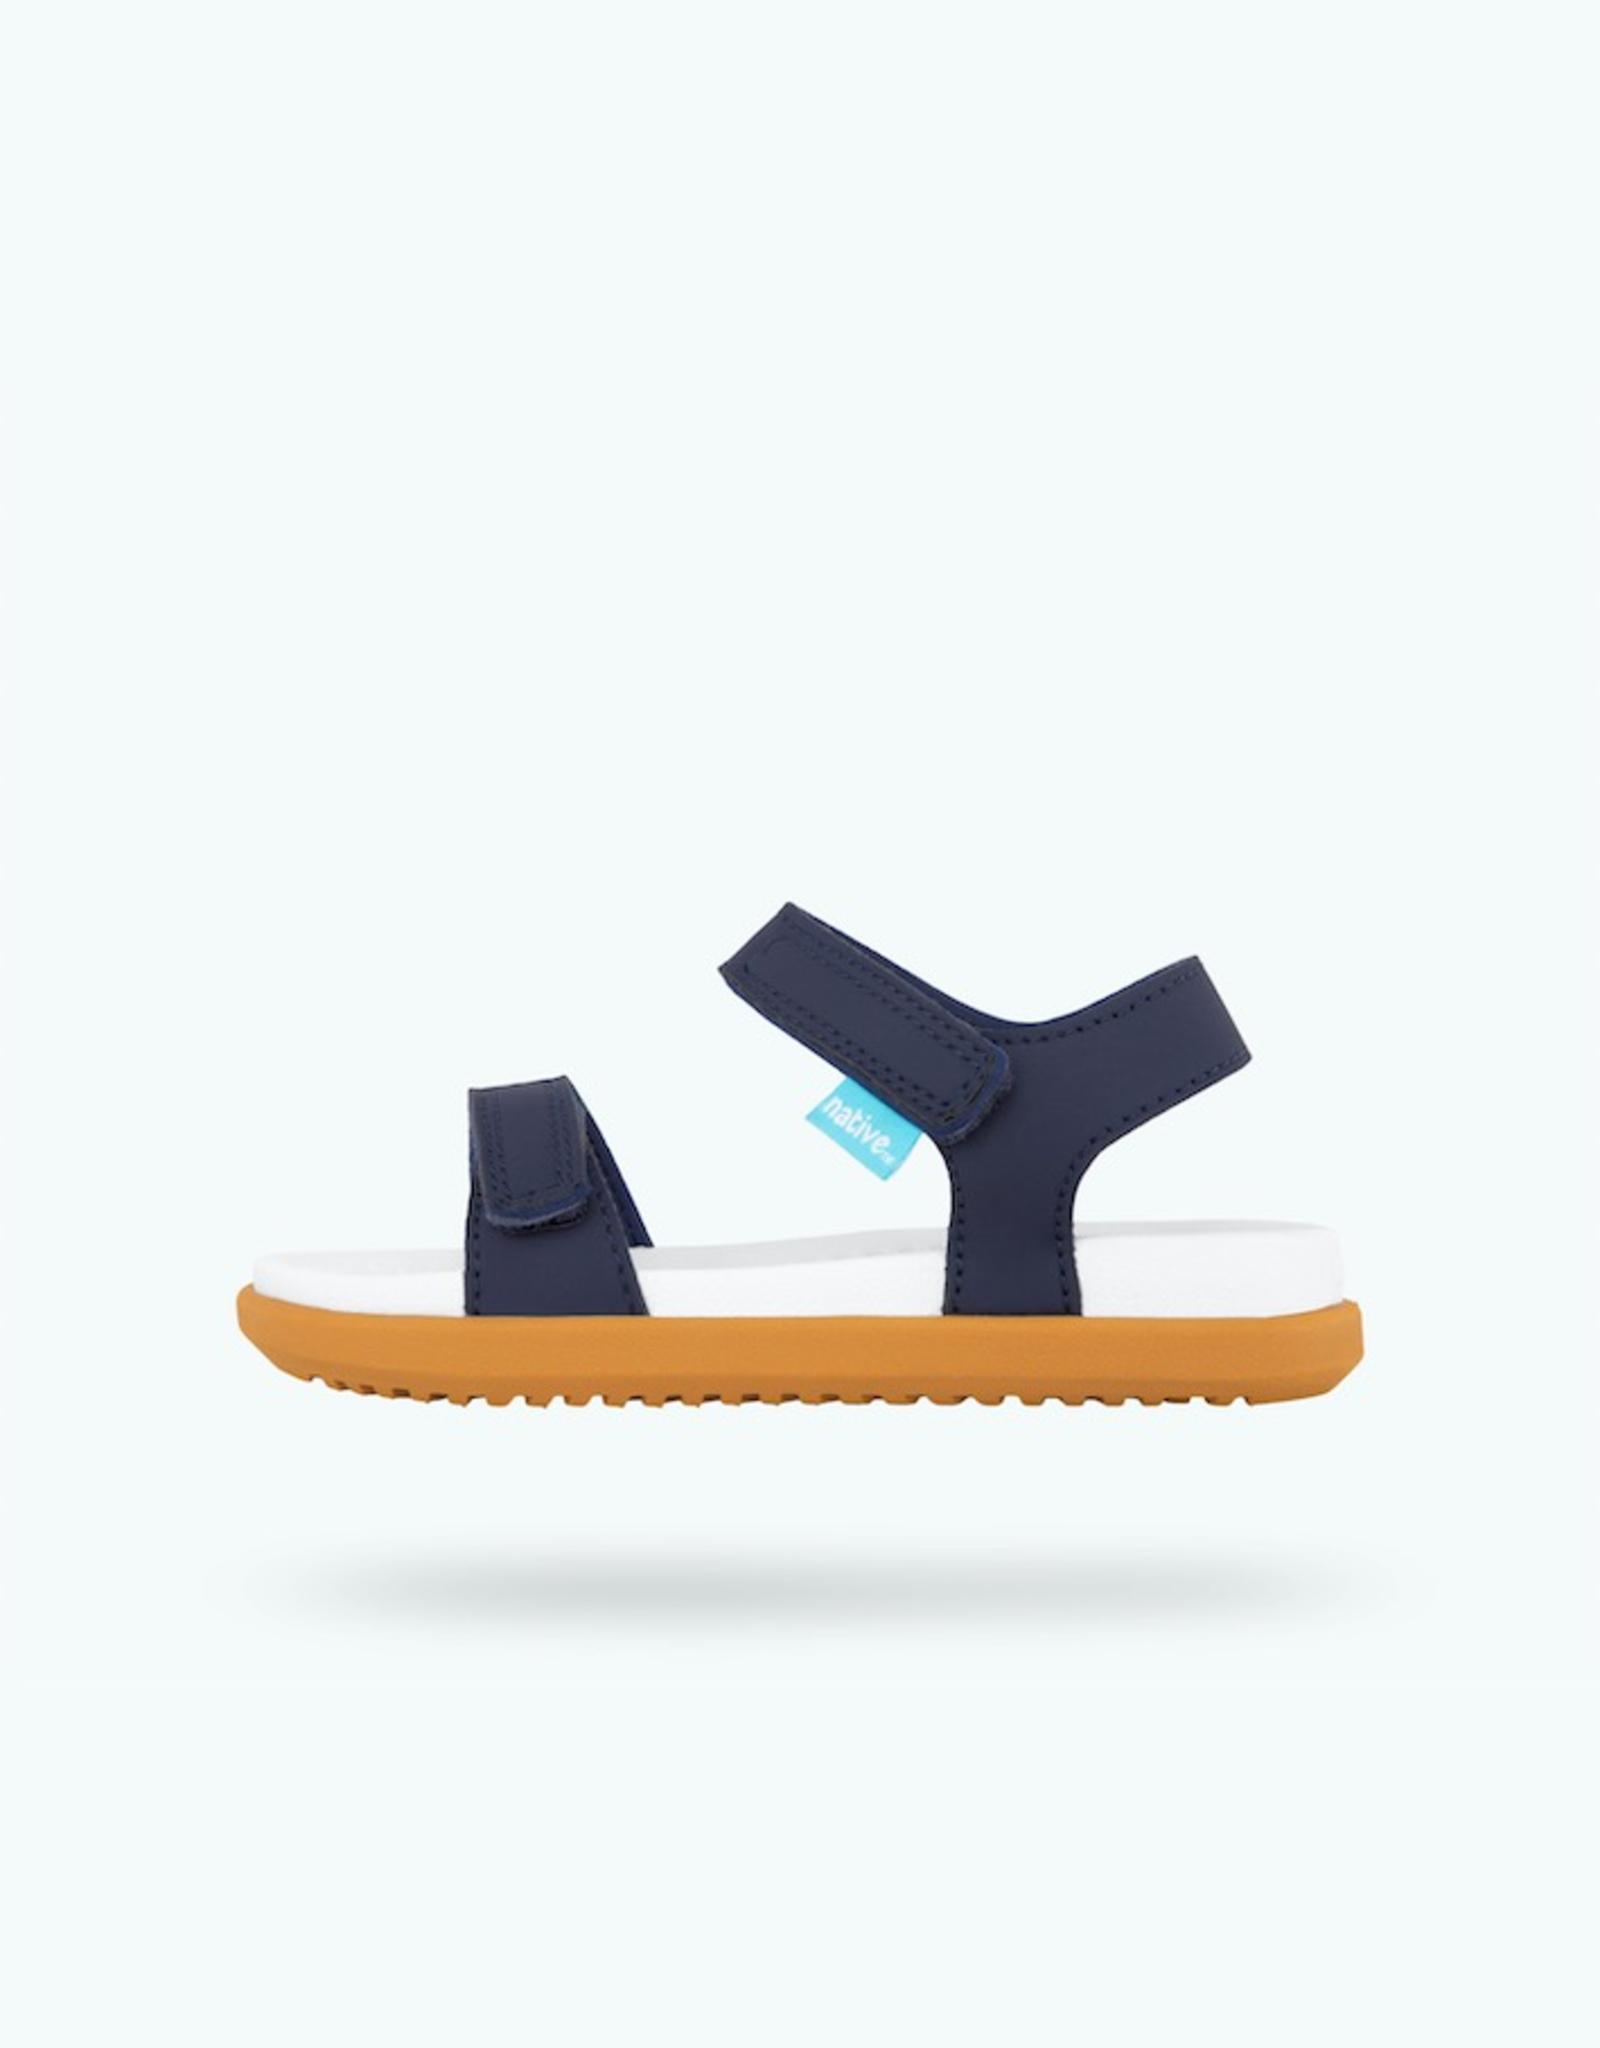 Native Shoes Charley Child in Regatta Blue